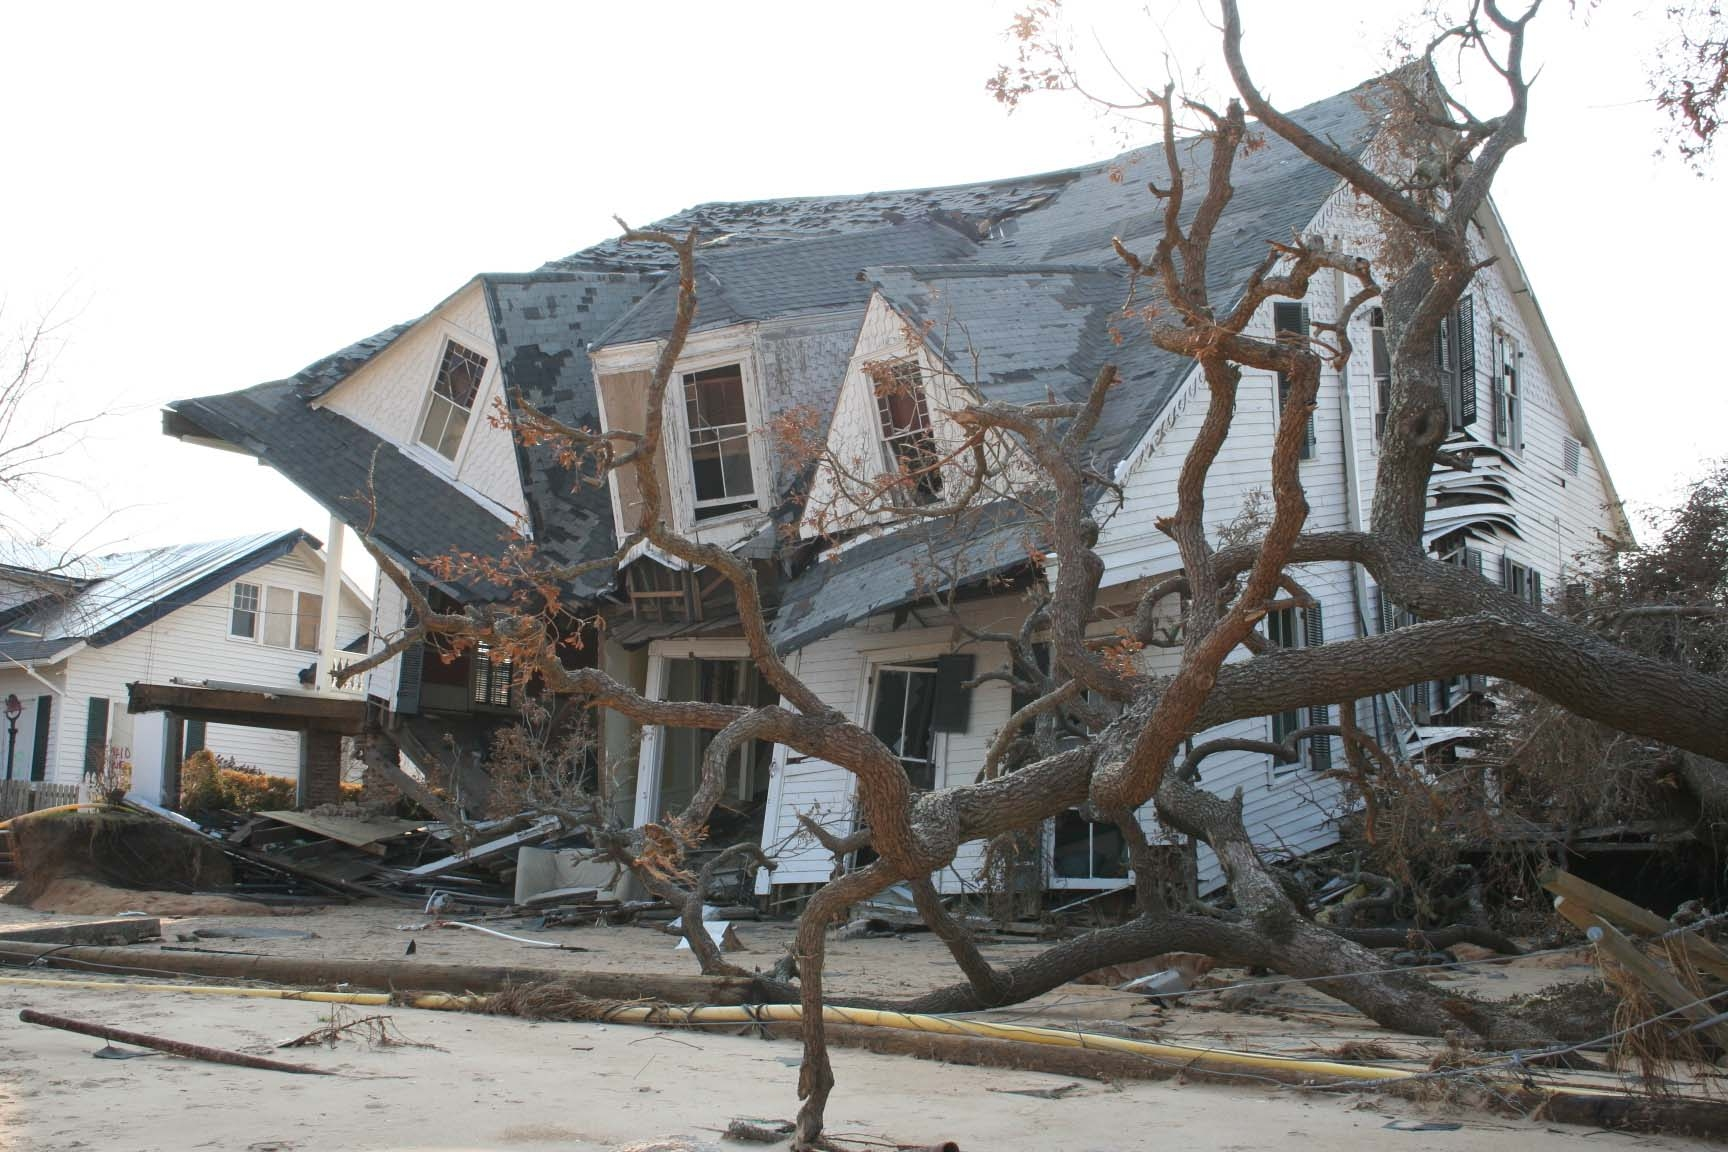 Aftermath of Hurricane Katrina in September, 2005. (Barbara Ambrose/NOAA)